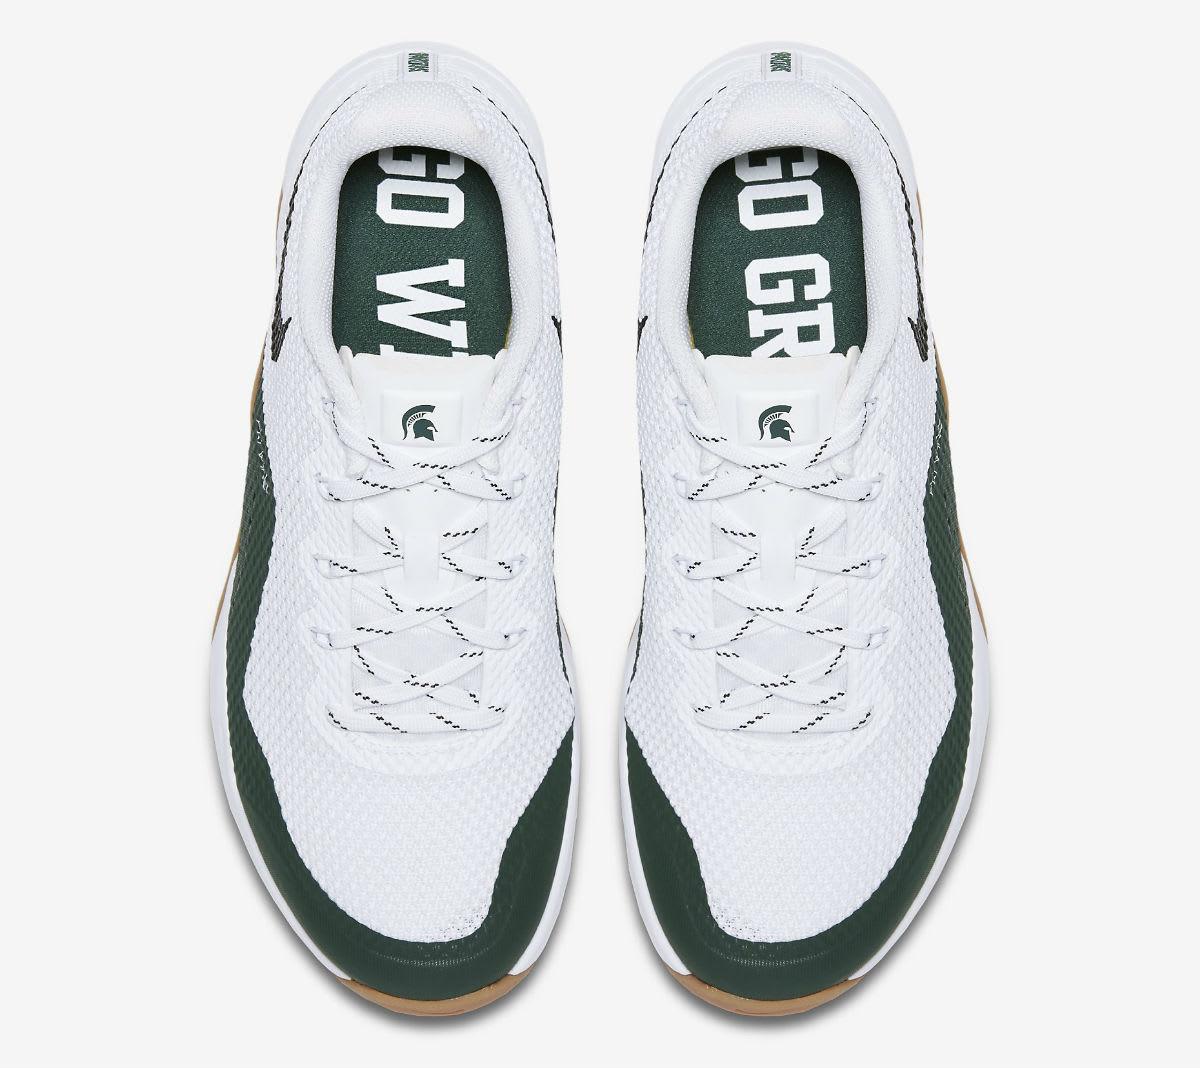 Nike Metcon Repper DSX Michigan State Release Date (2)